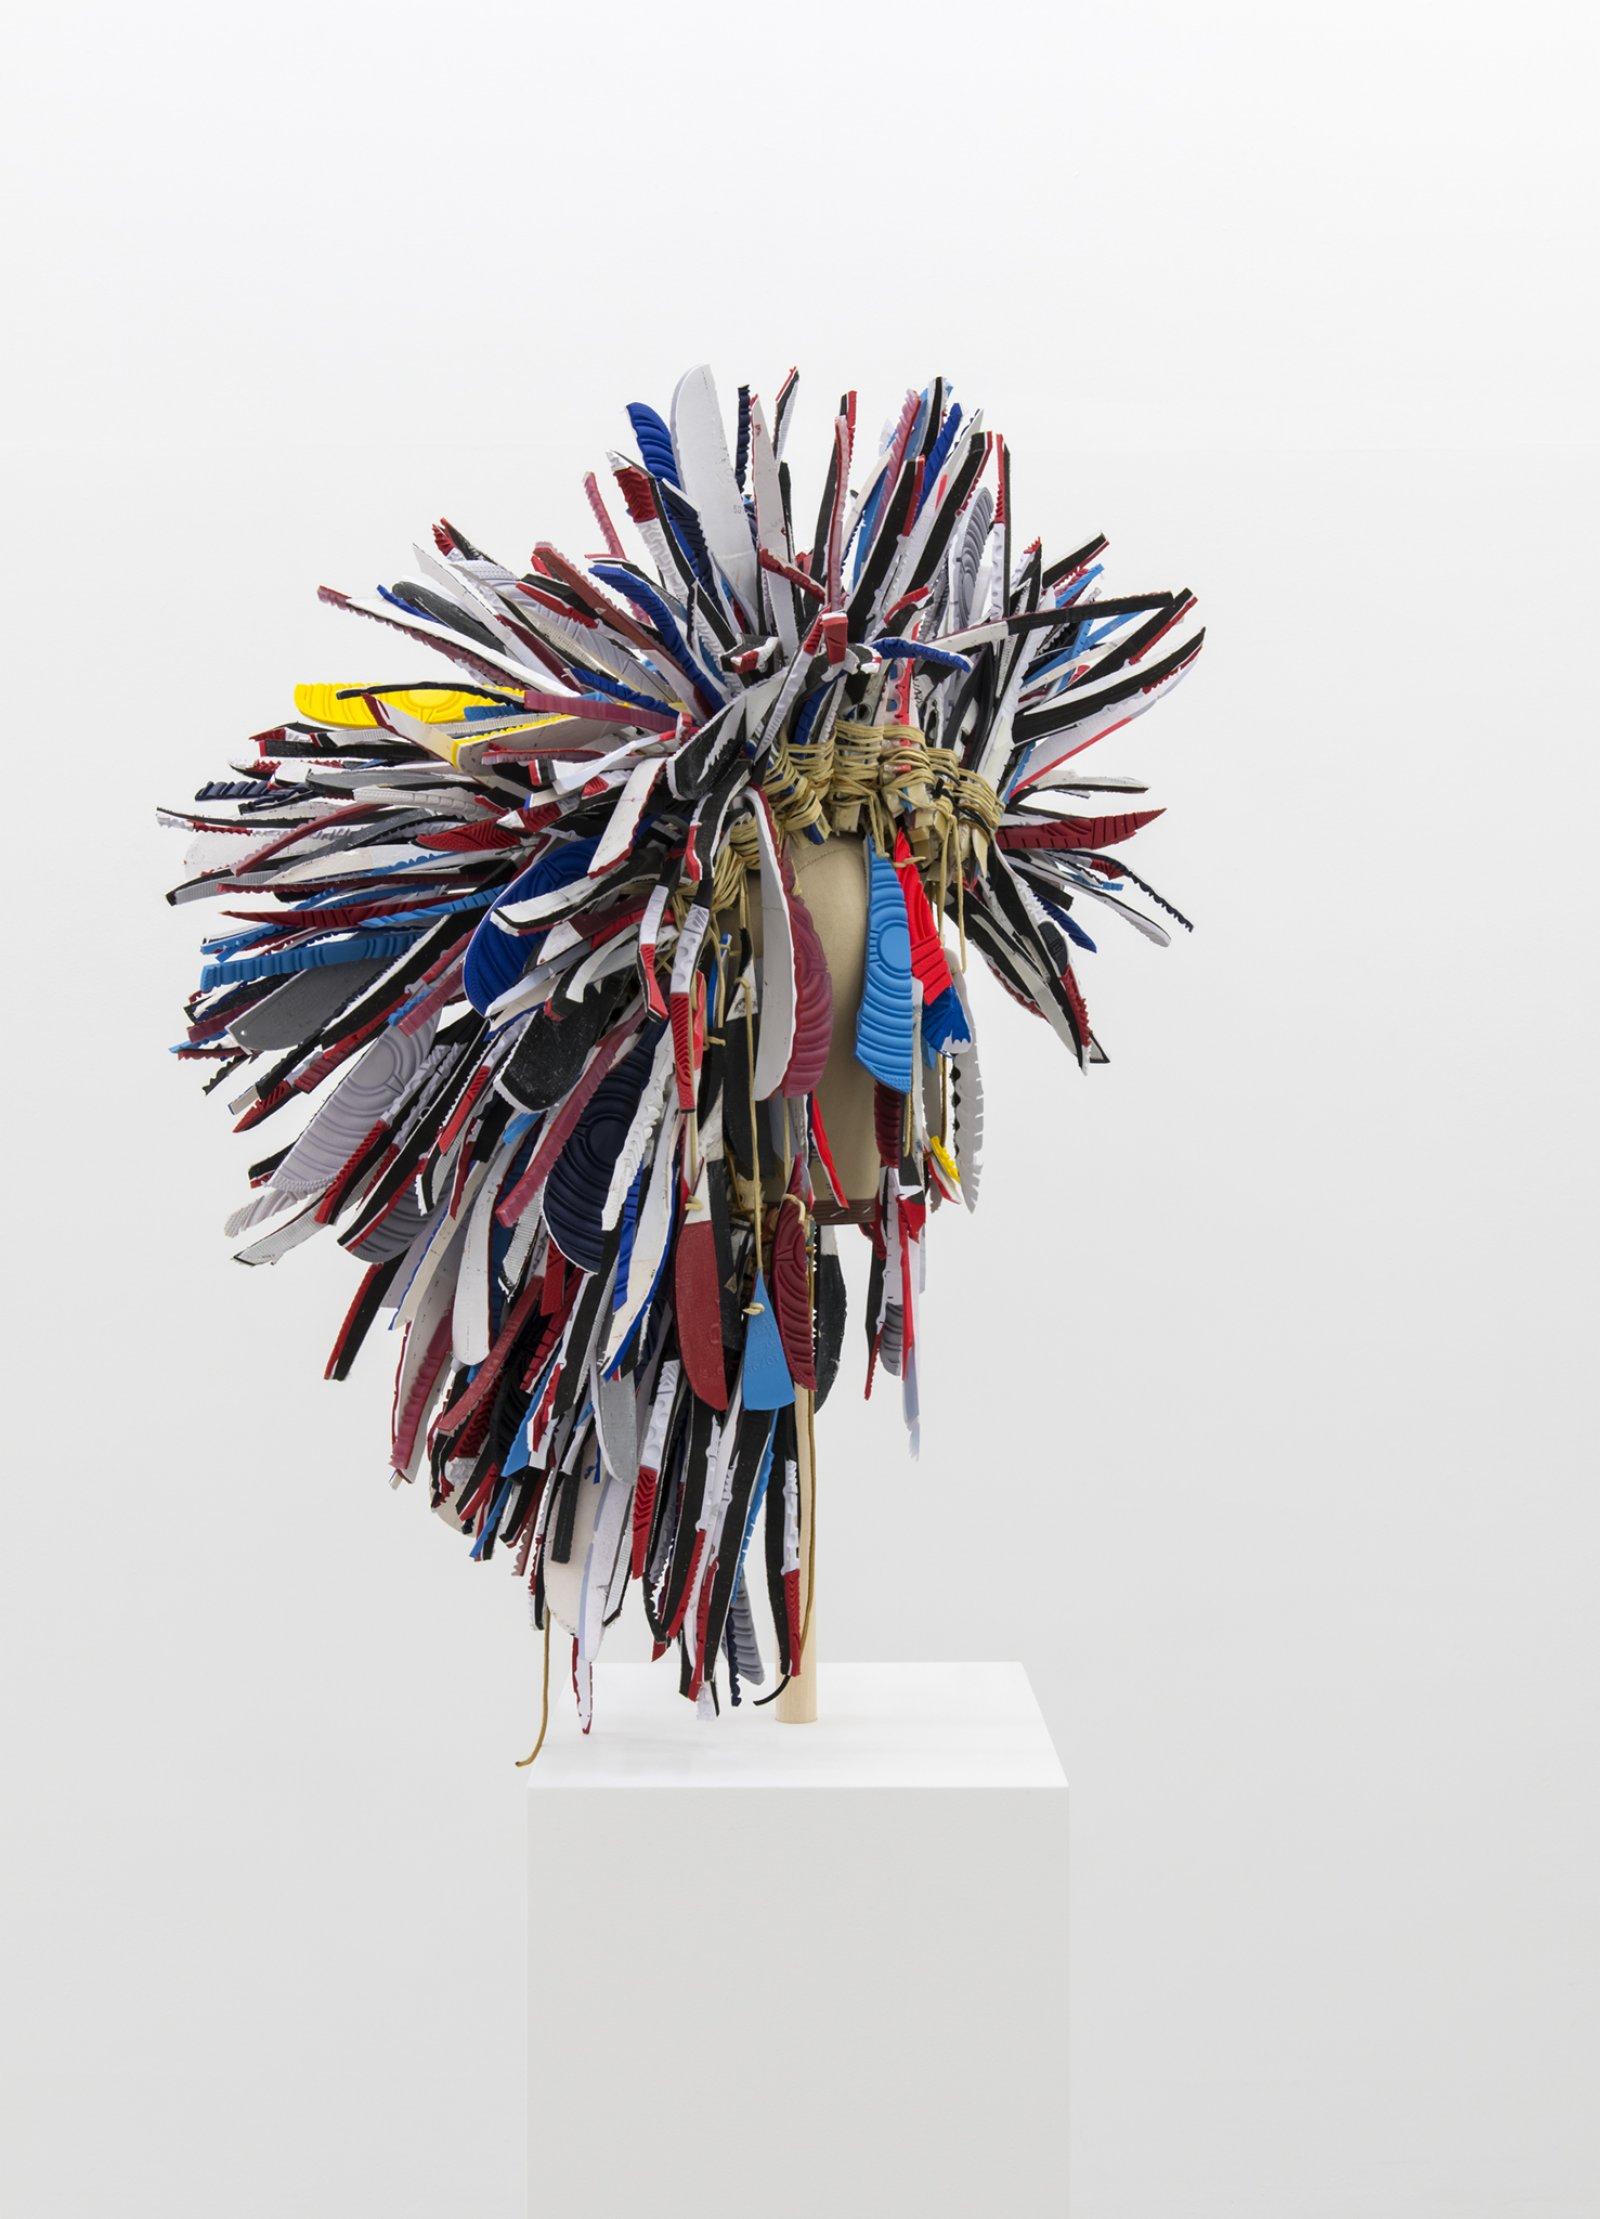 Brian Jungen,Warrior 2, 2017, nike air jordans, hide glue, deerskin, 77 x 29 x 24 in. (196 x 74 x 61 cm)